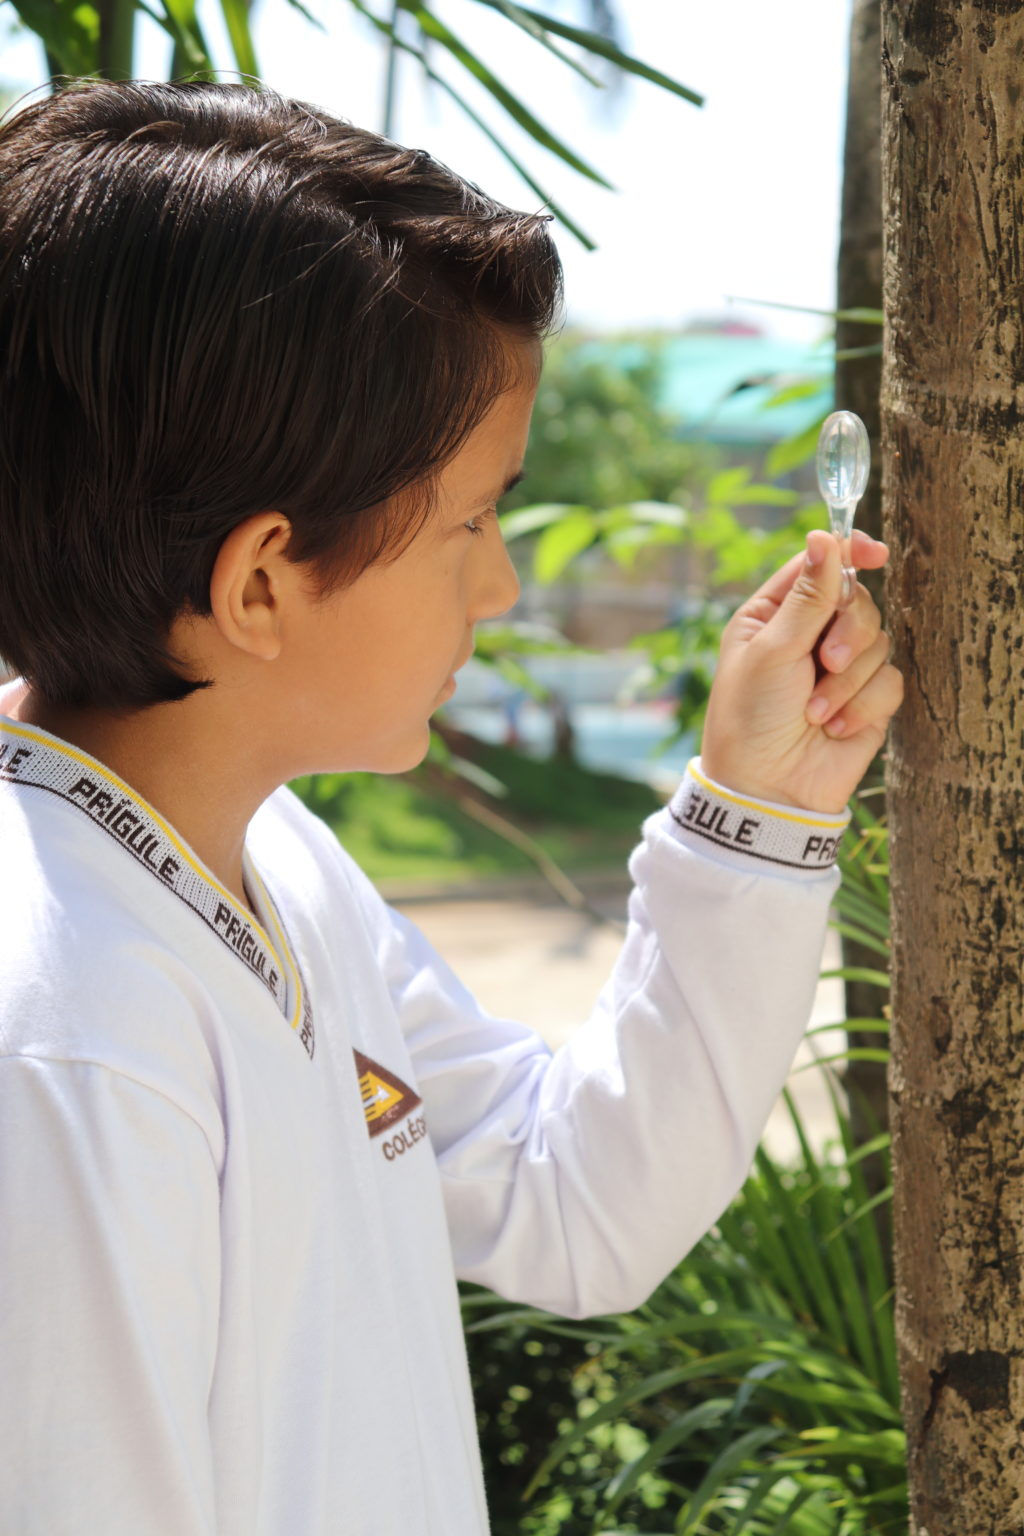 Aluno com mini lupa observando tronco de árvore